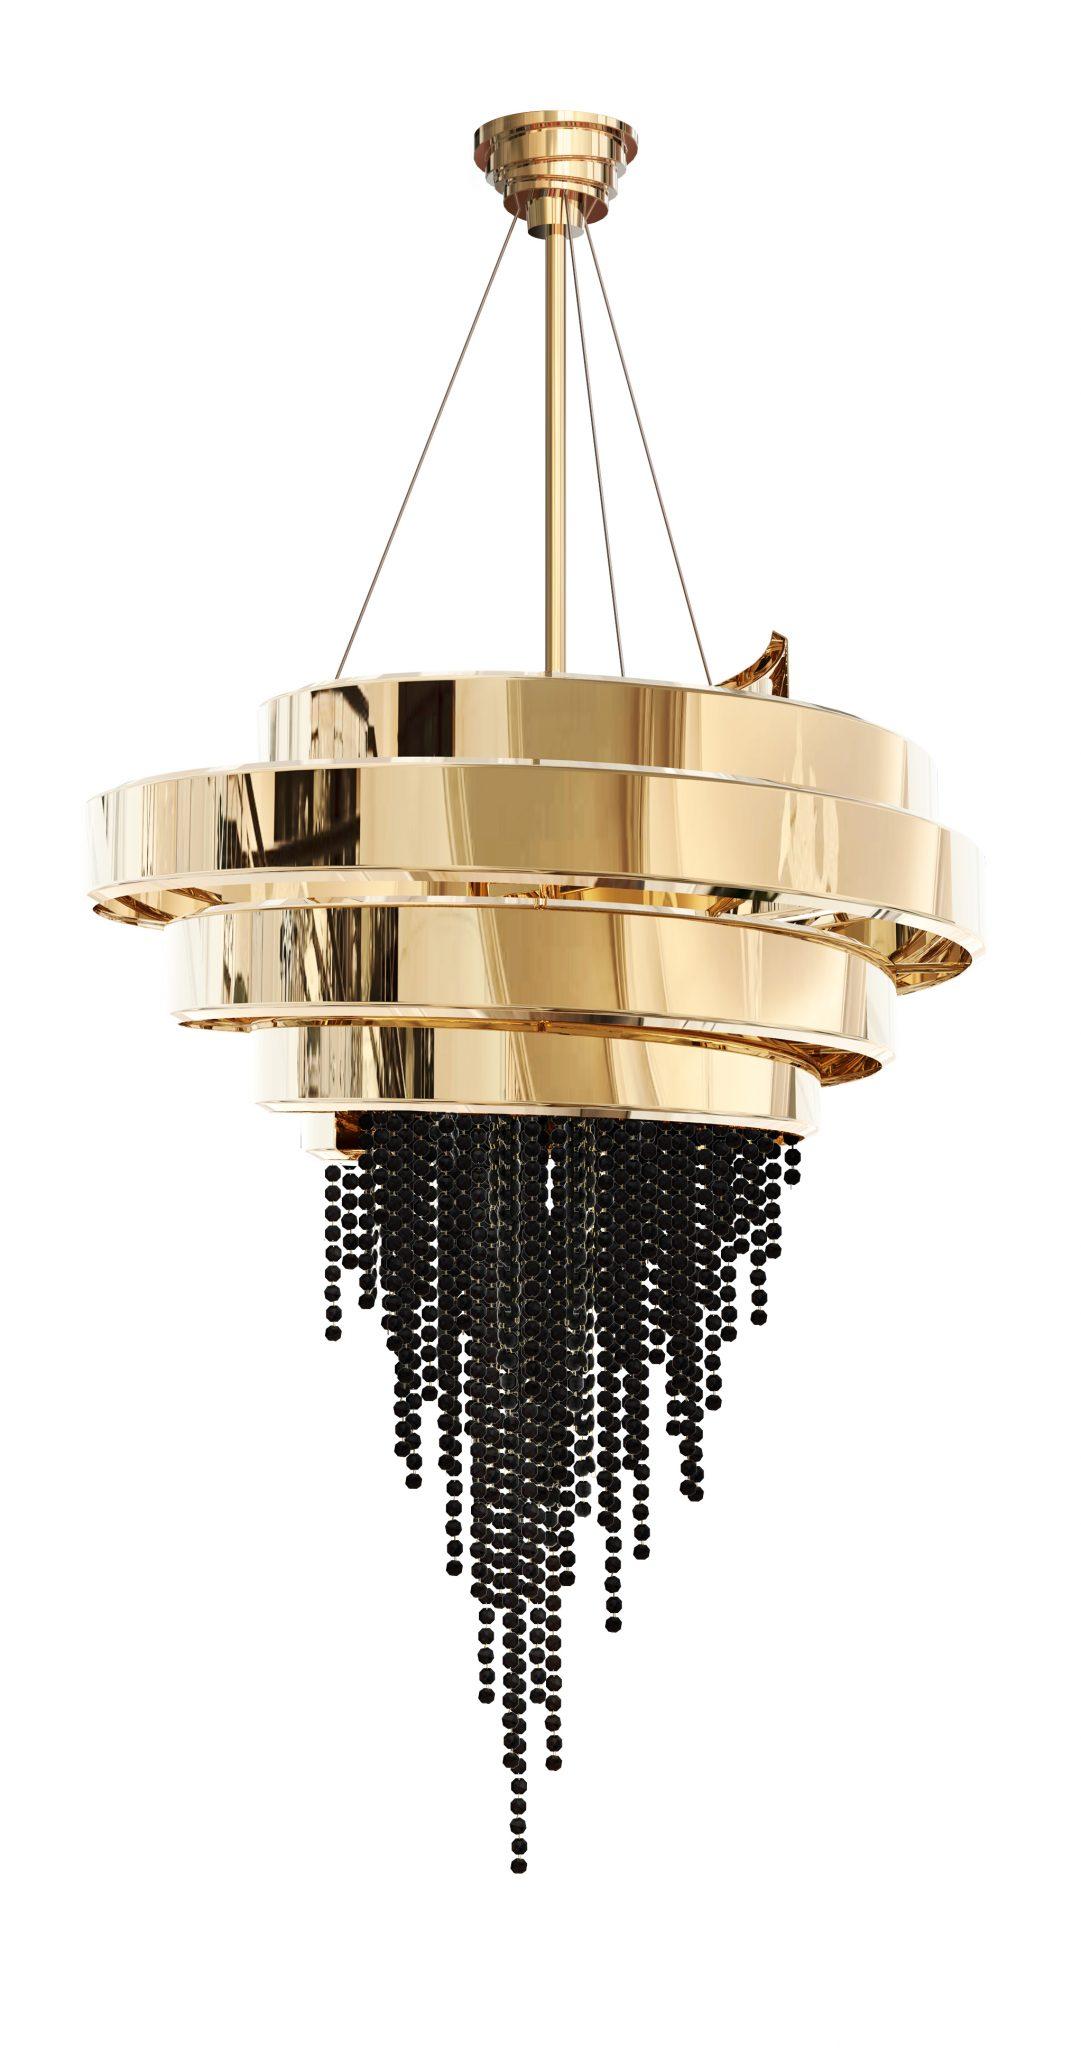 guggenheim-chandelier-01